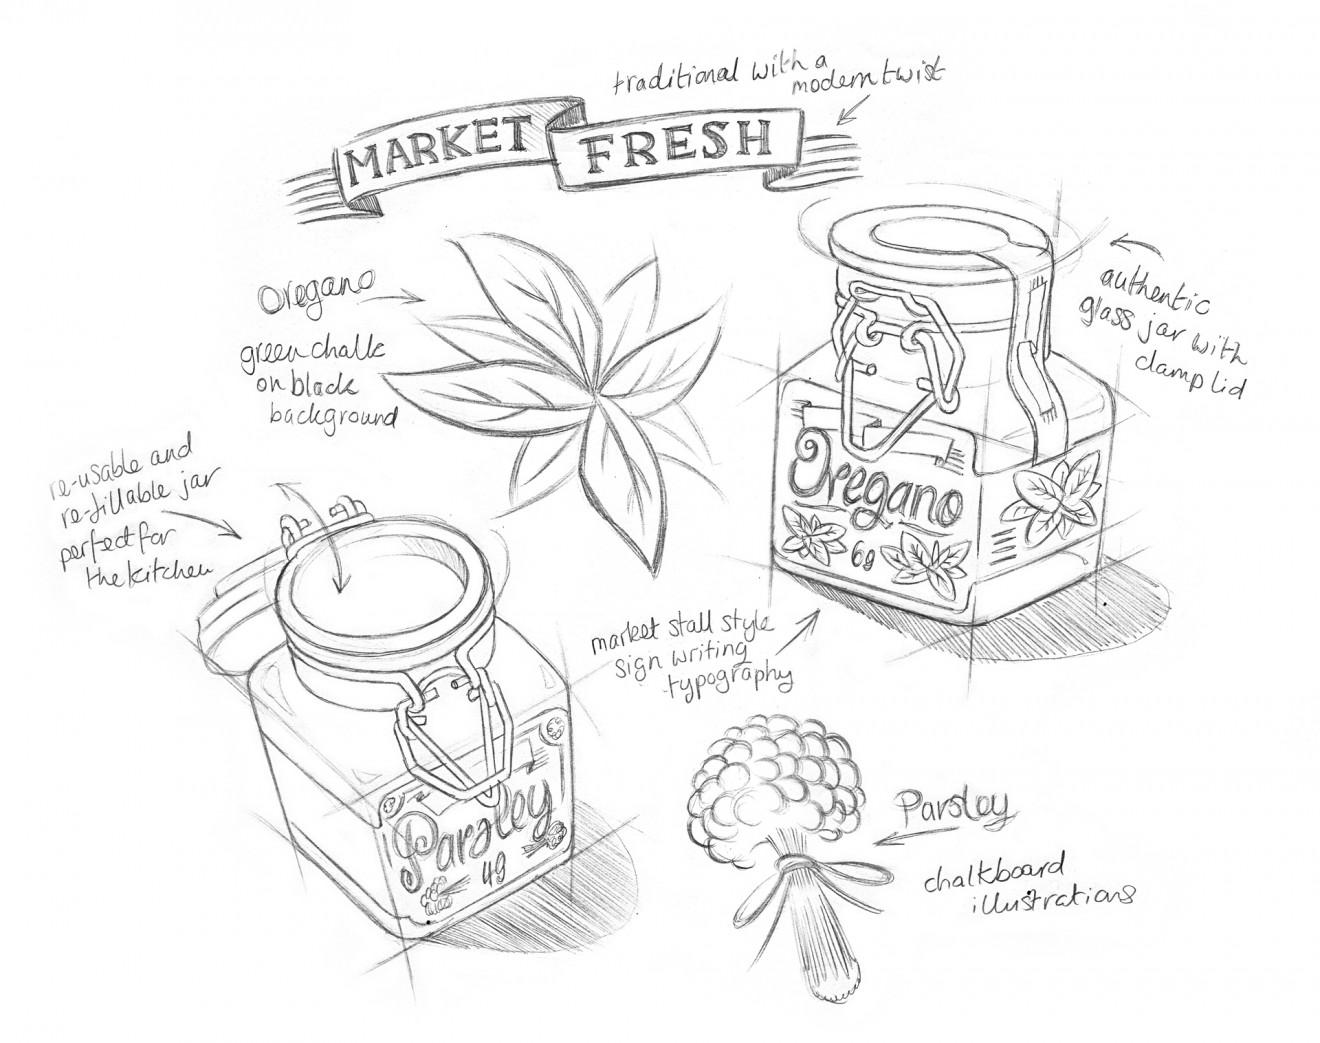 Quatre Mains package design - Sketch, Market Fresh, Weck